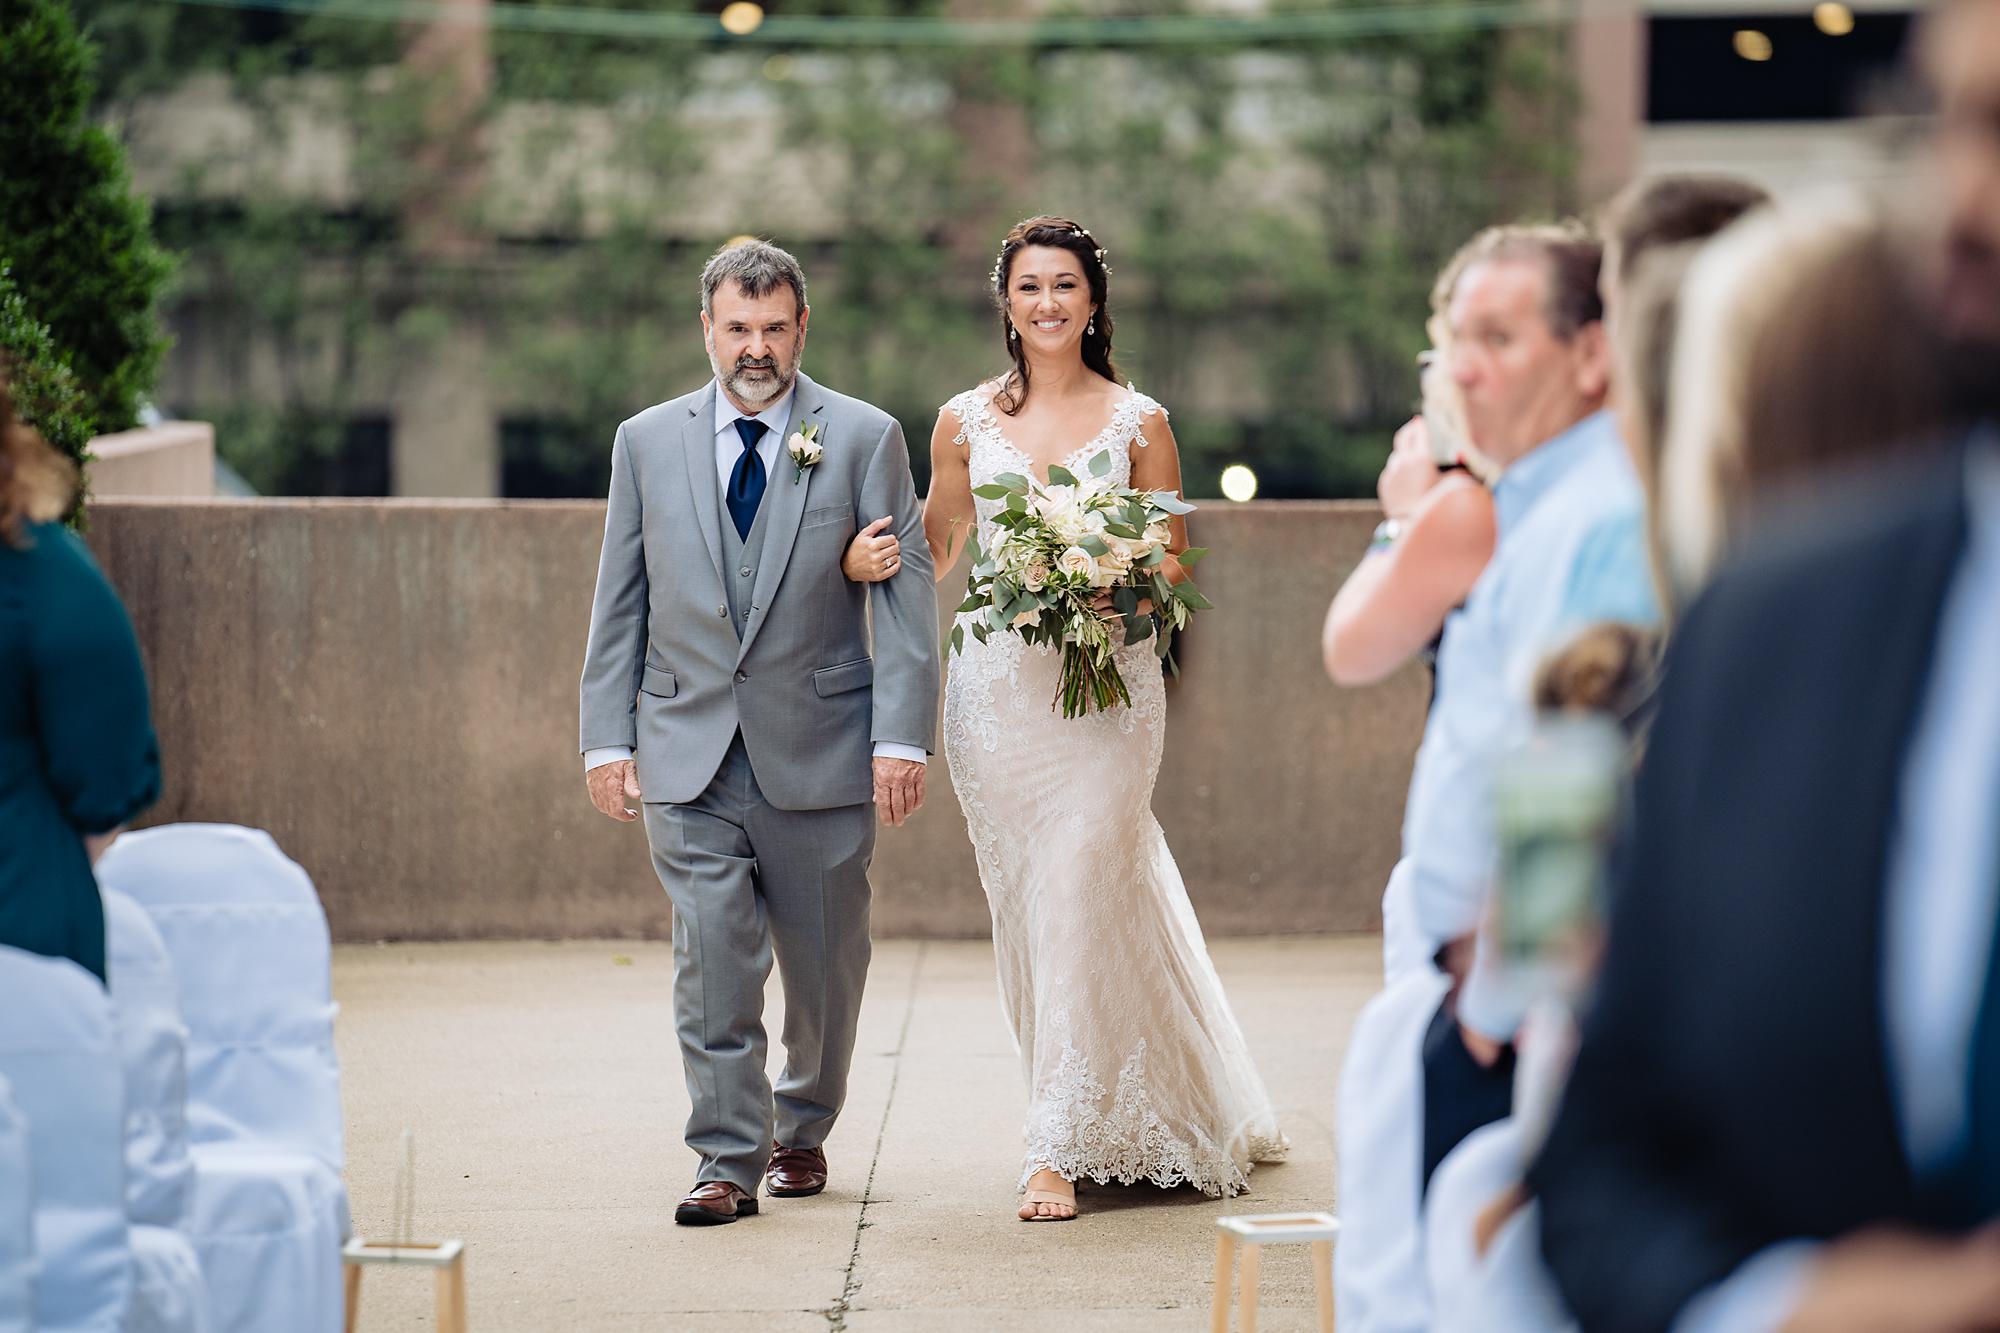 Embassy-Suites-Rivercenter-Wedding-Photography-19.jpg